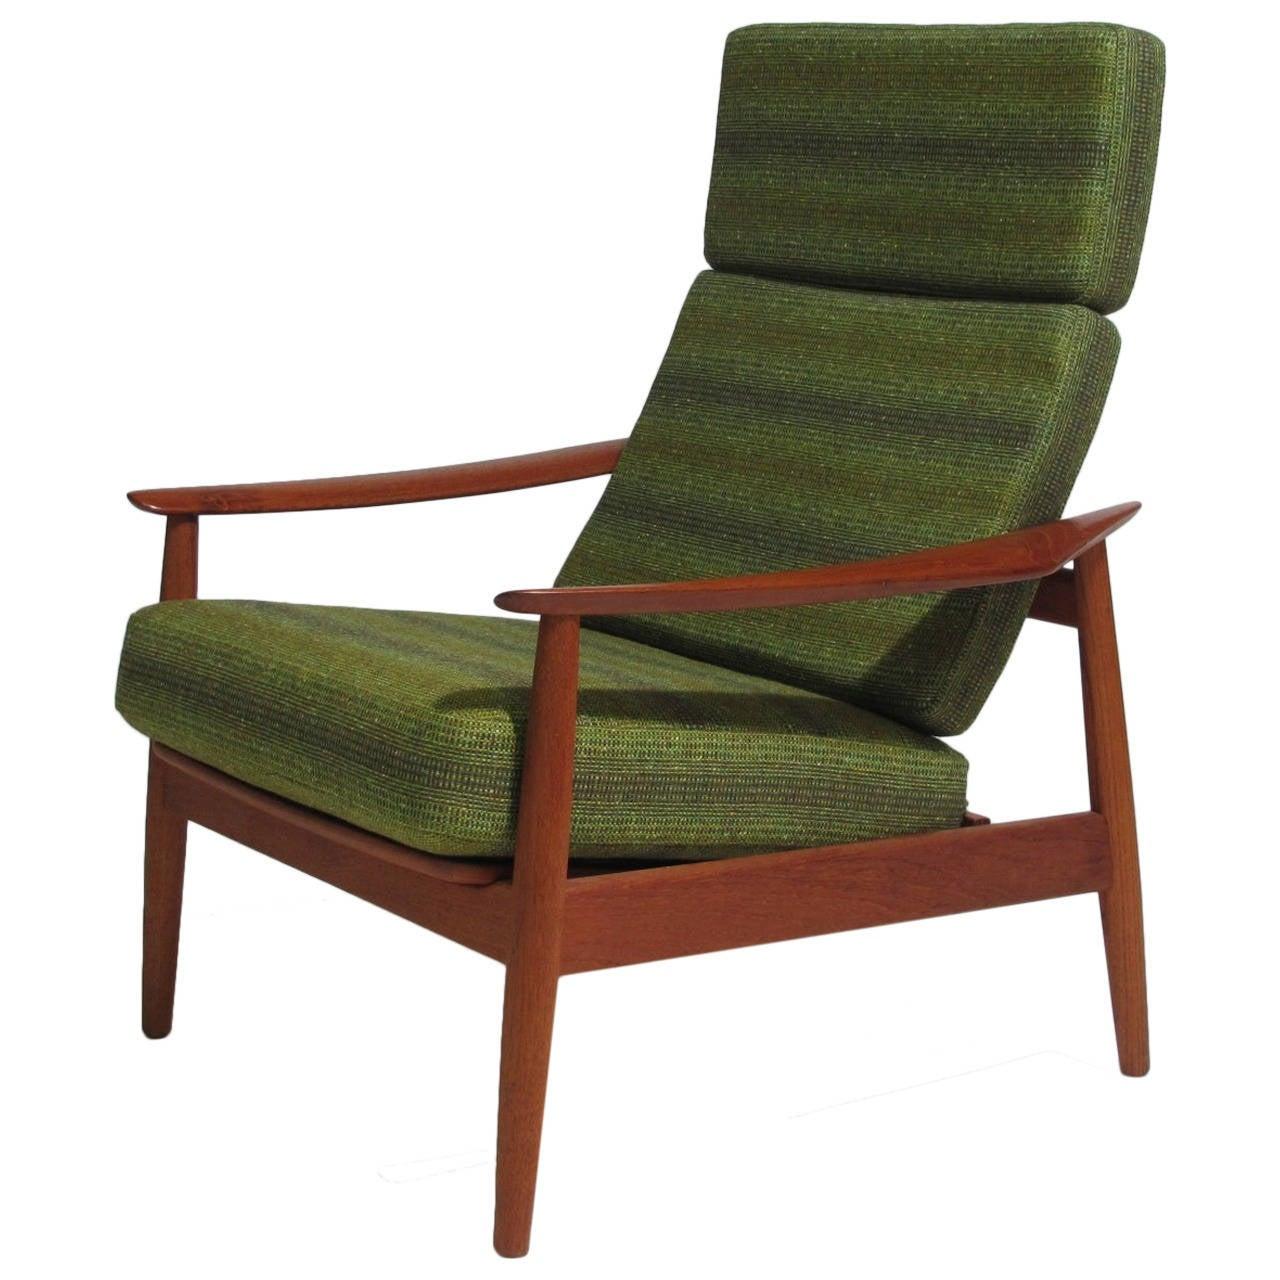 Arne Vodder Danish High Back Lounge Chair at 1stdibs